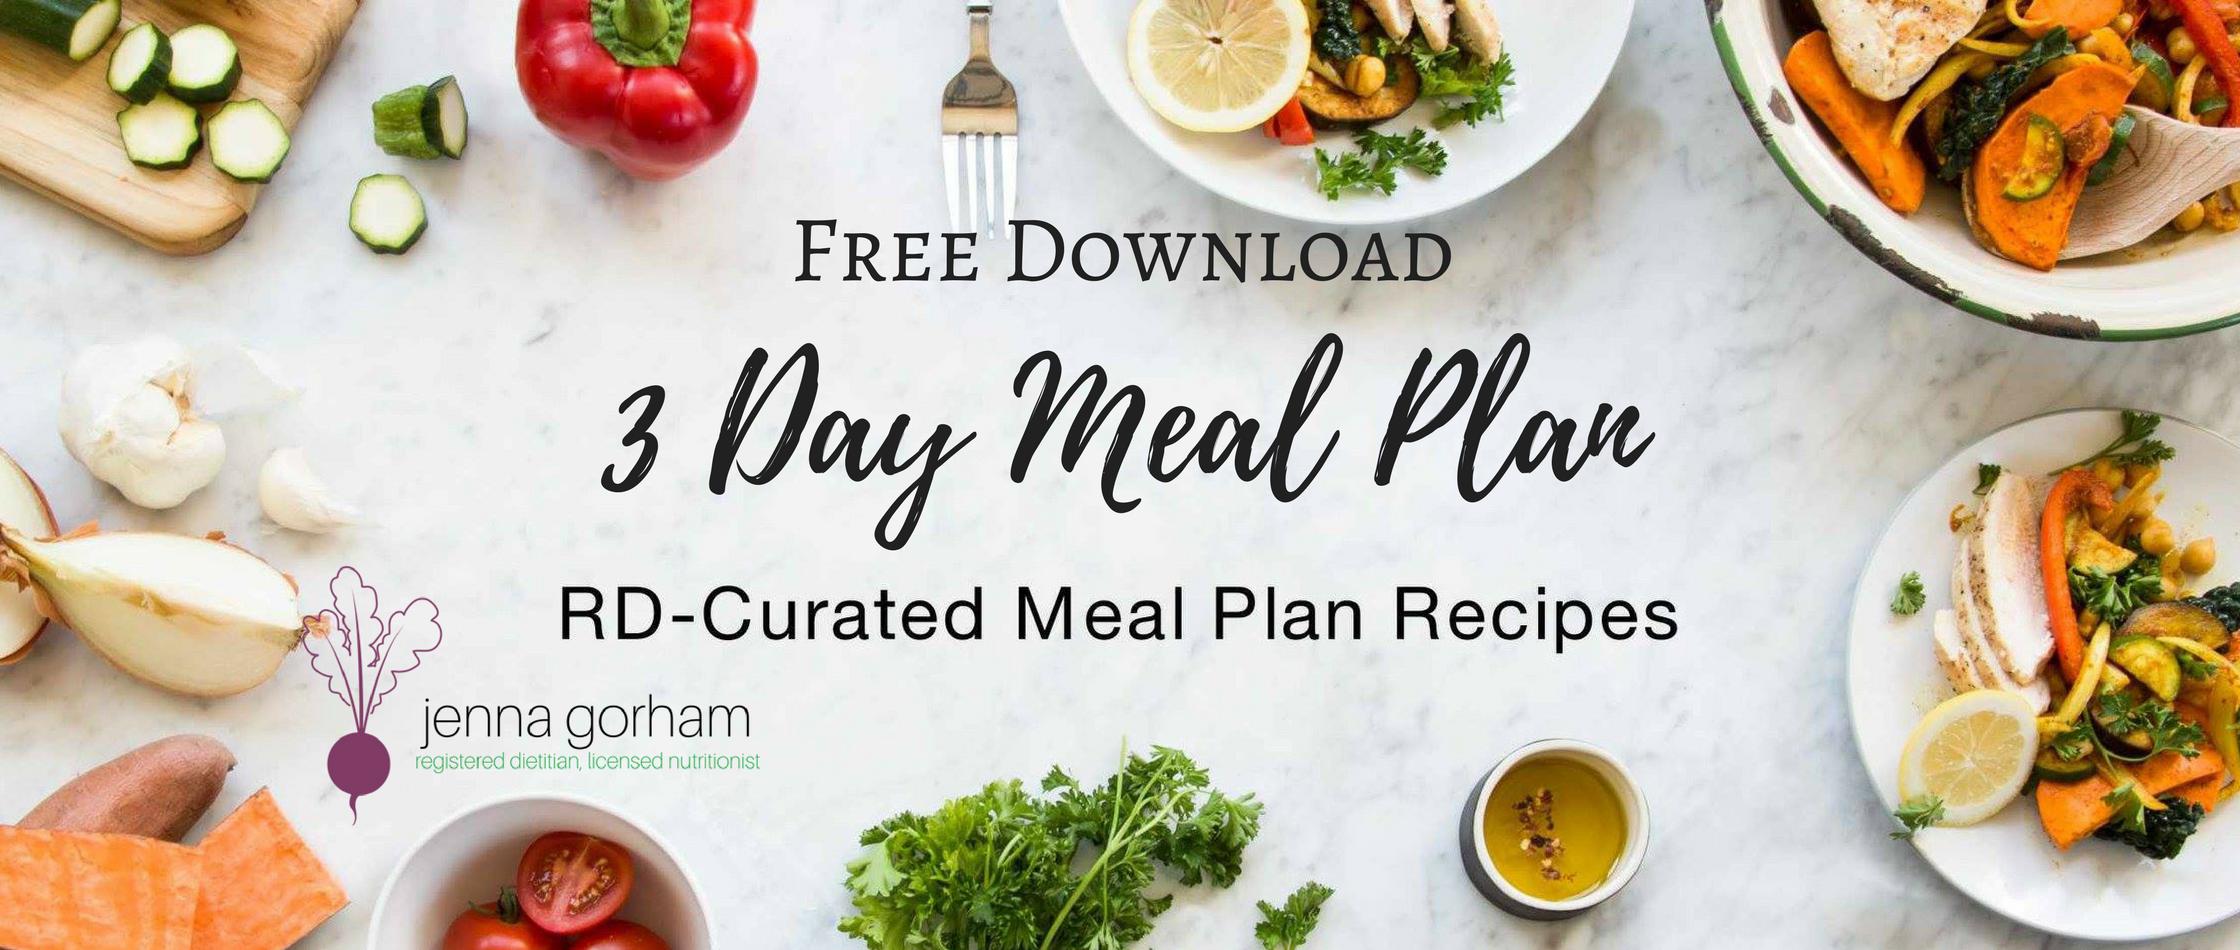 Meal plans jenna gorham rd registered dietitian licensed new opt in meal plan downloadg forumfinder Gallery